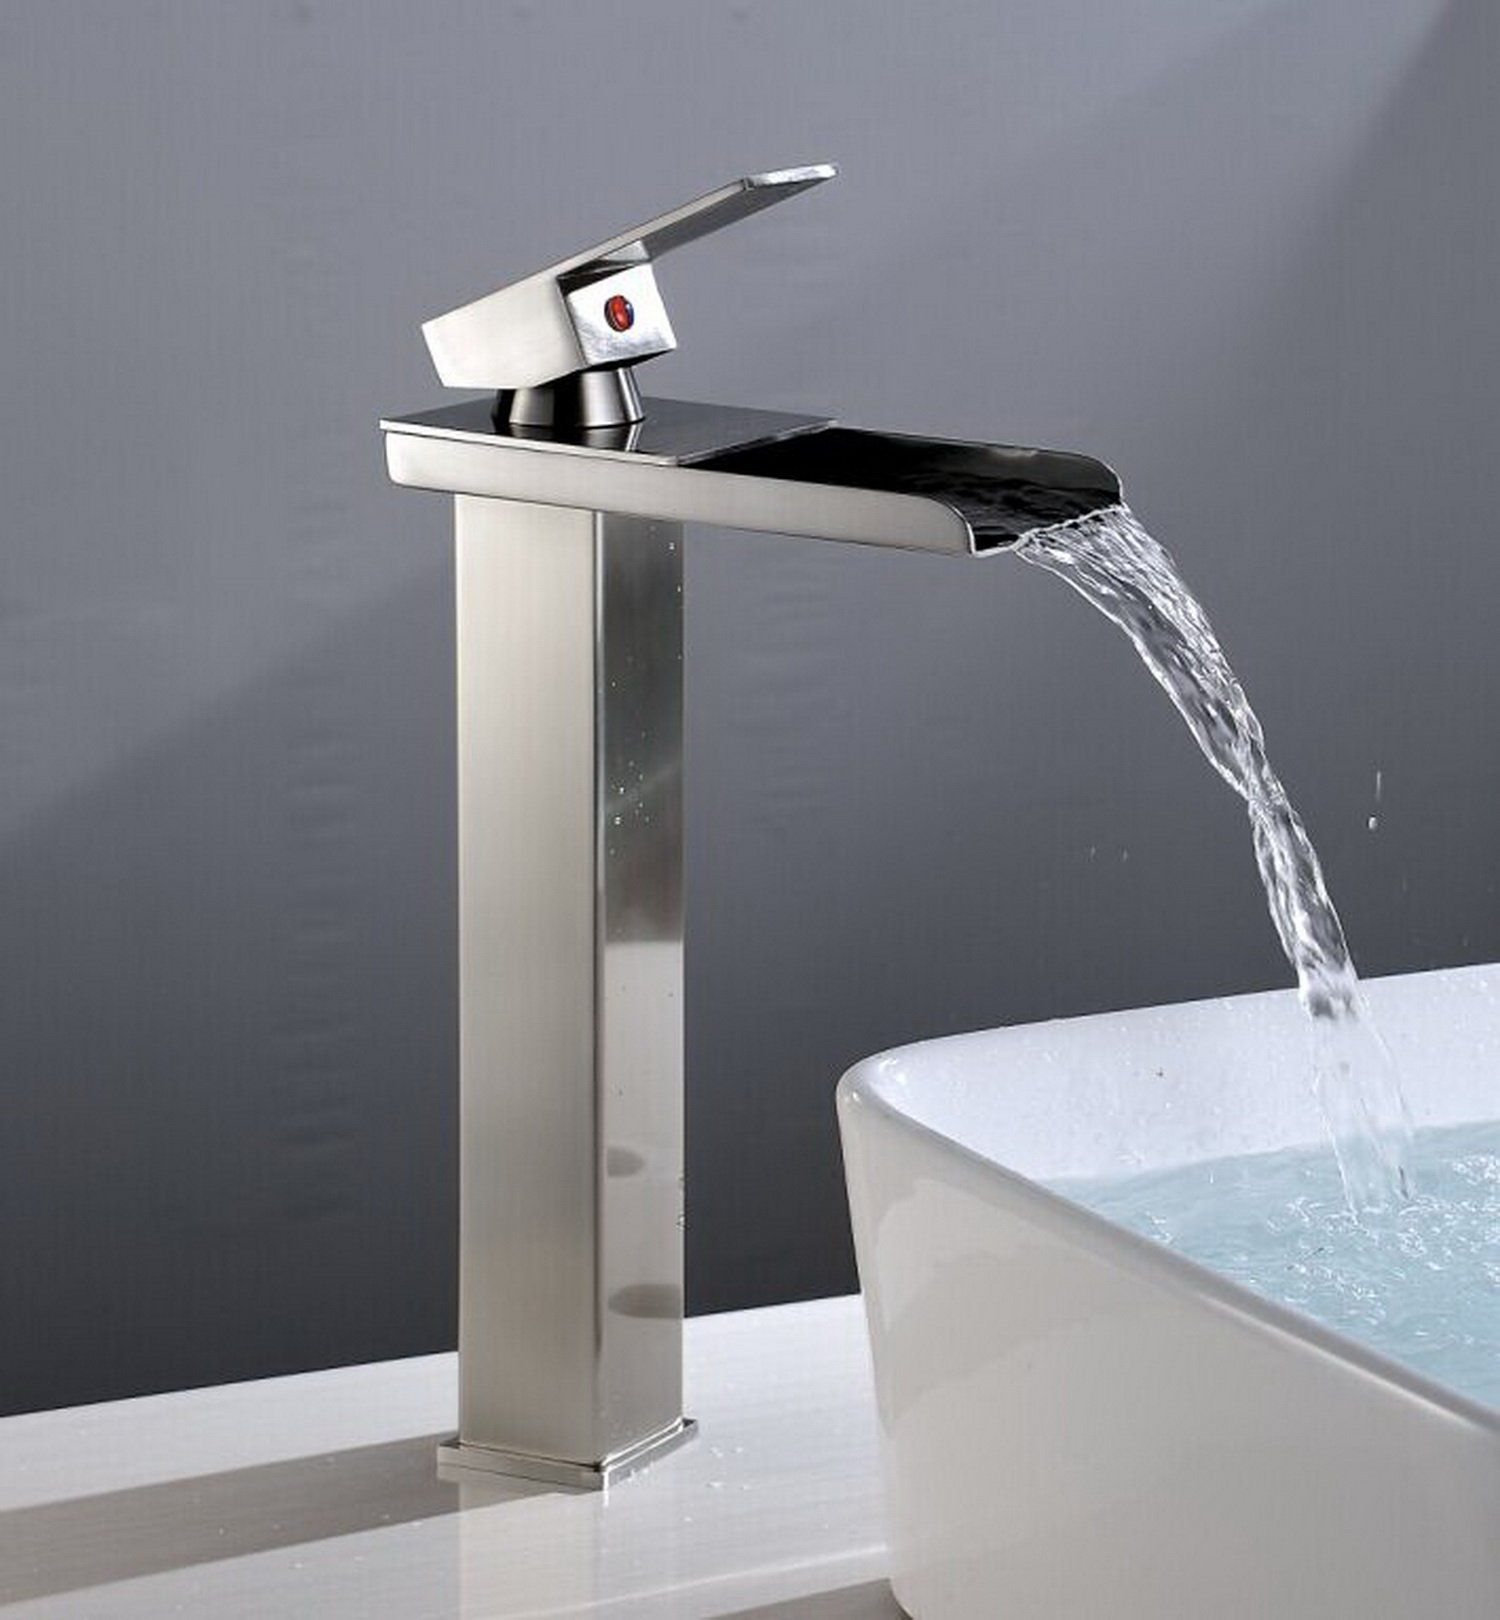 Aquafaucet Tall Nickel Brushed Waterfall Bathroom Sink Vessel faucet ...